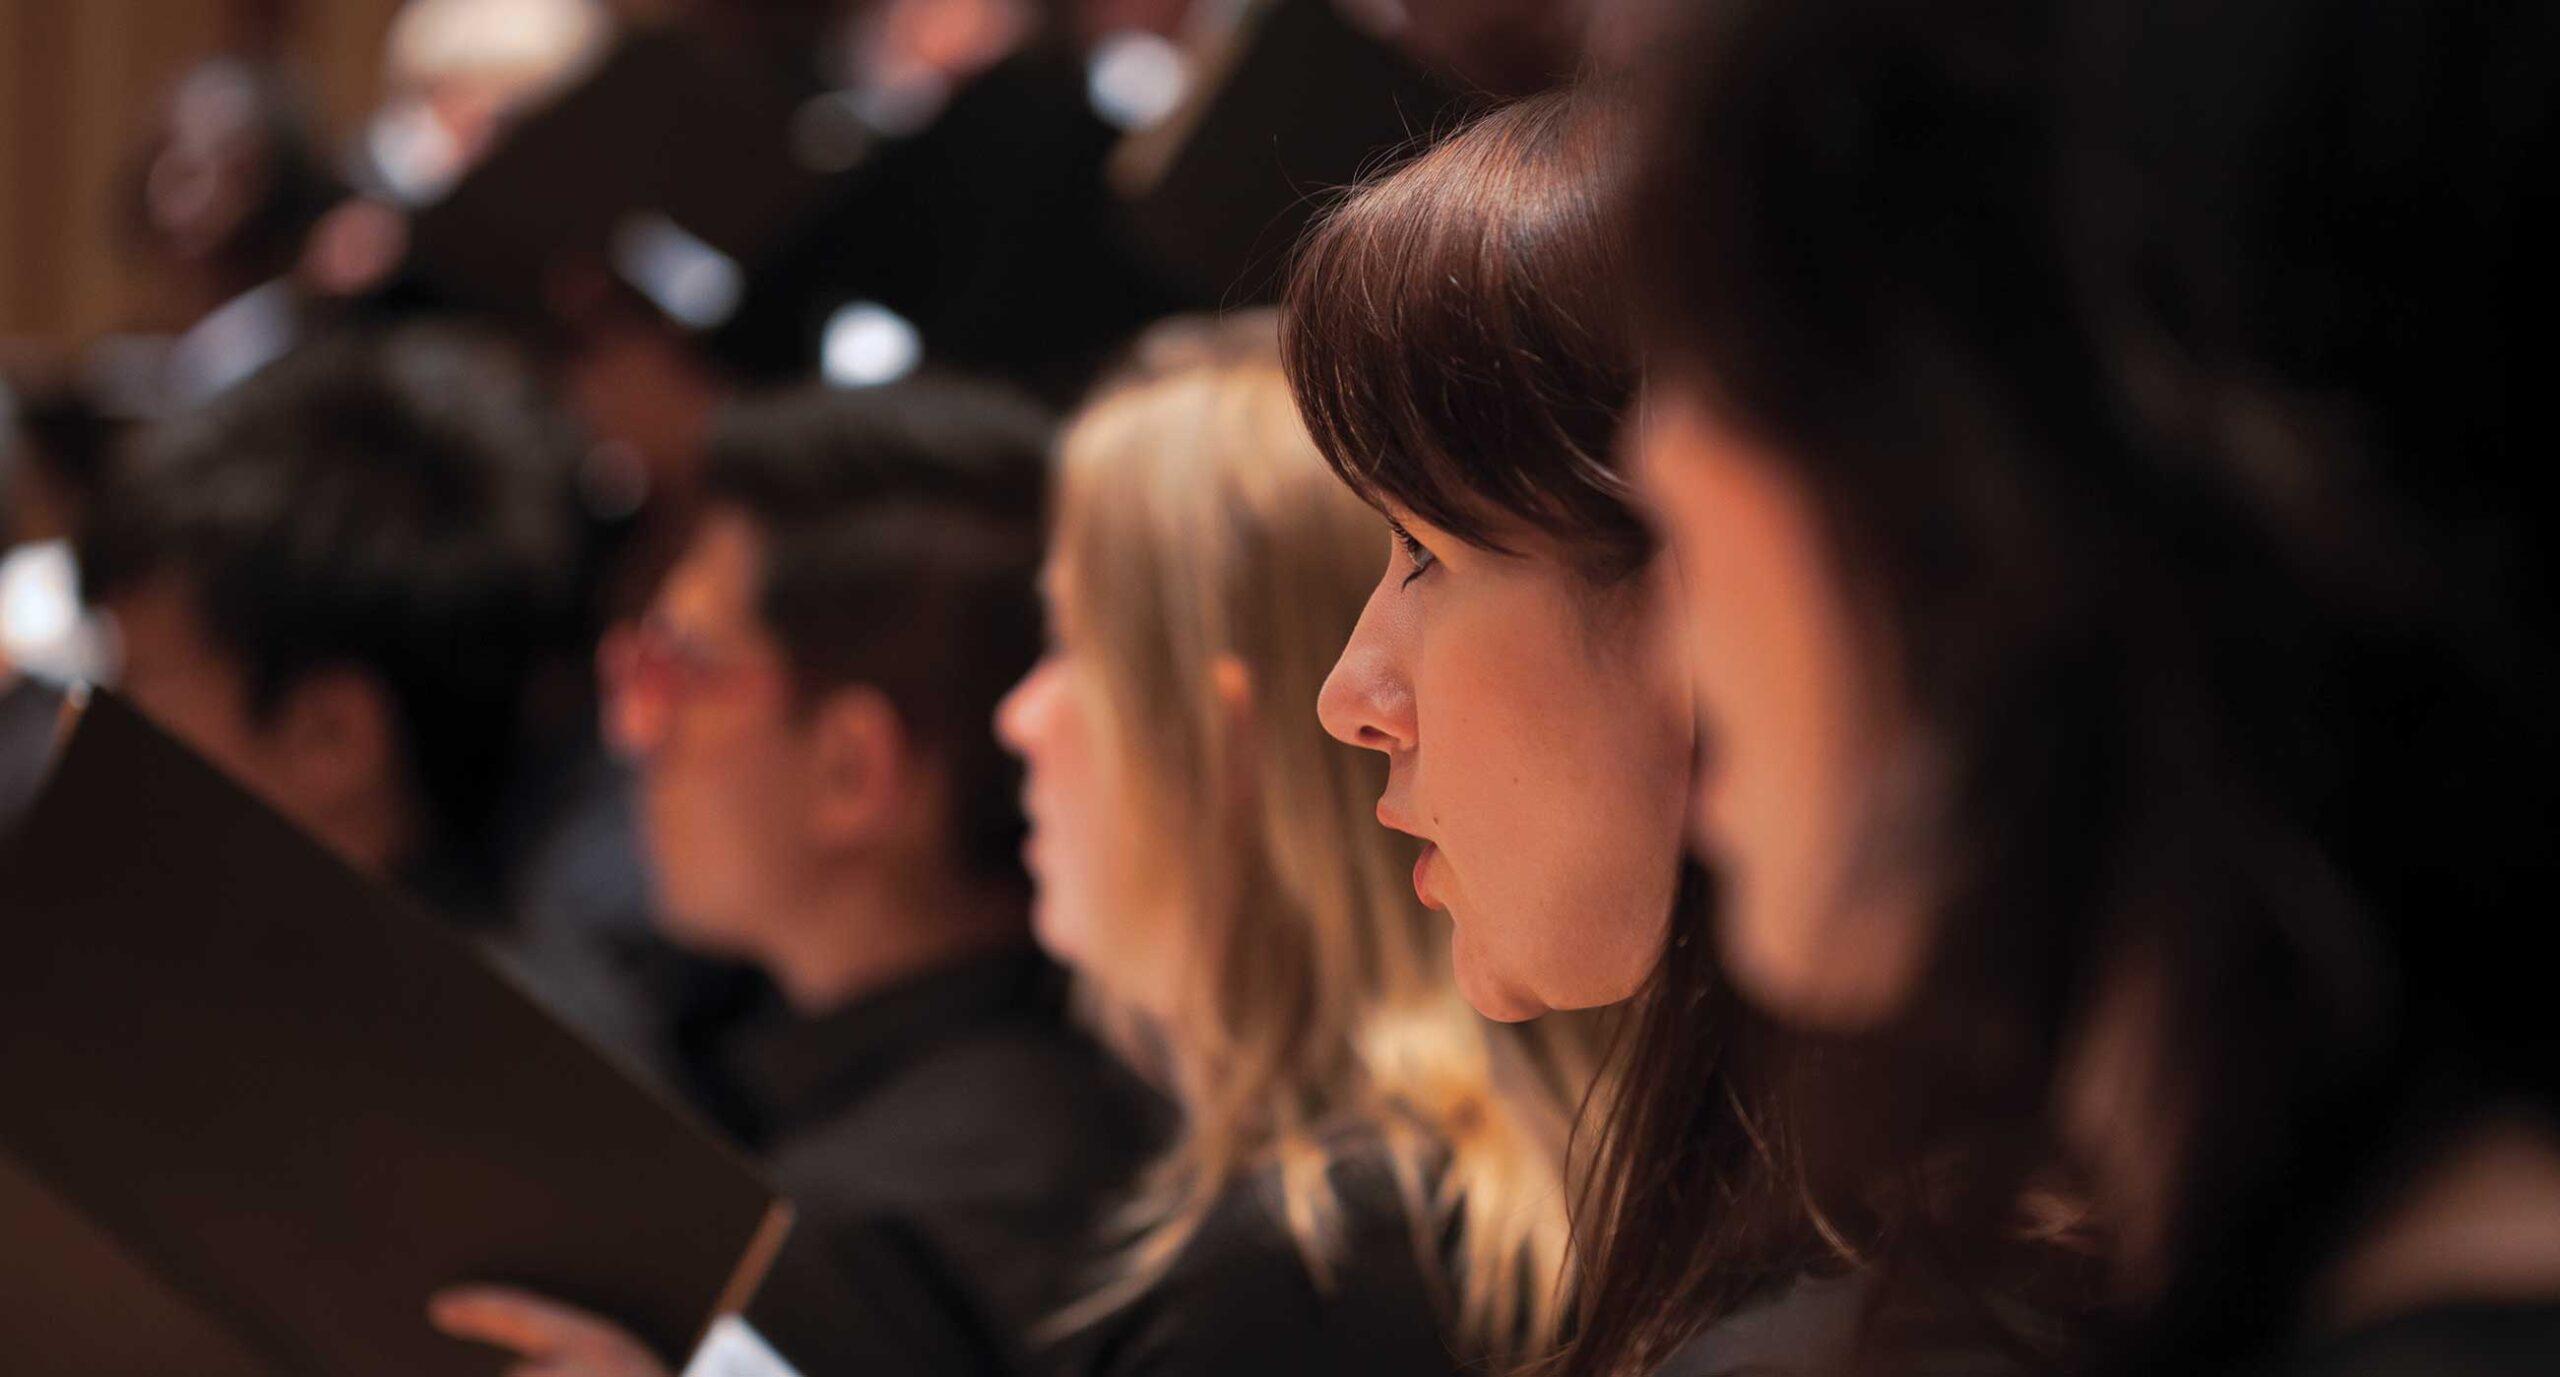 Adult choir members lined up